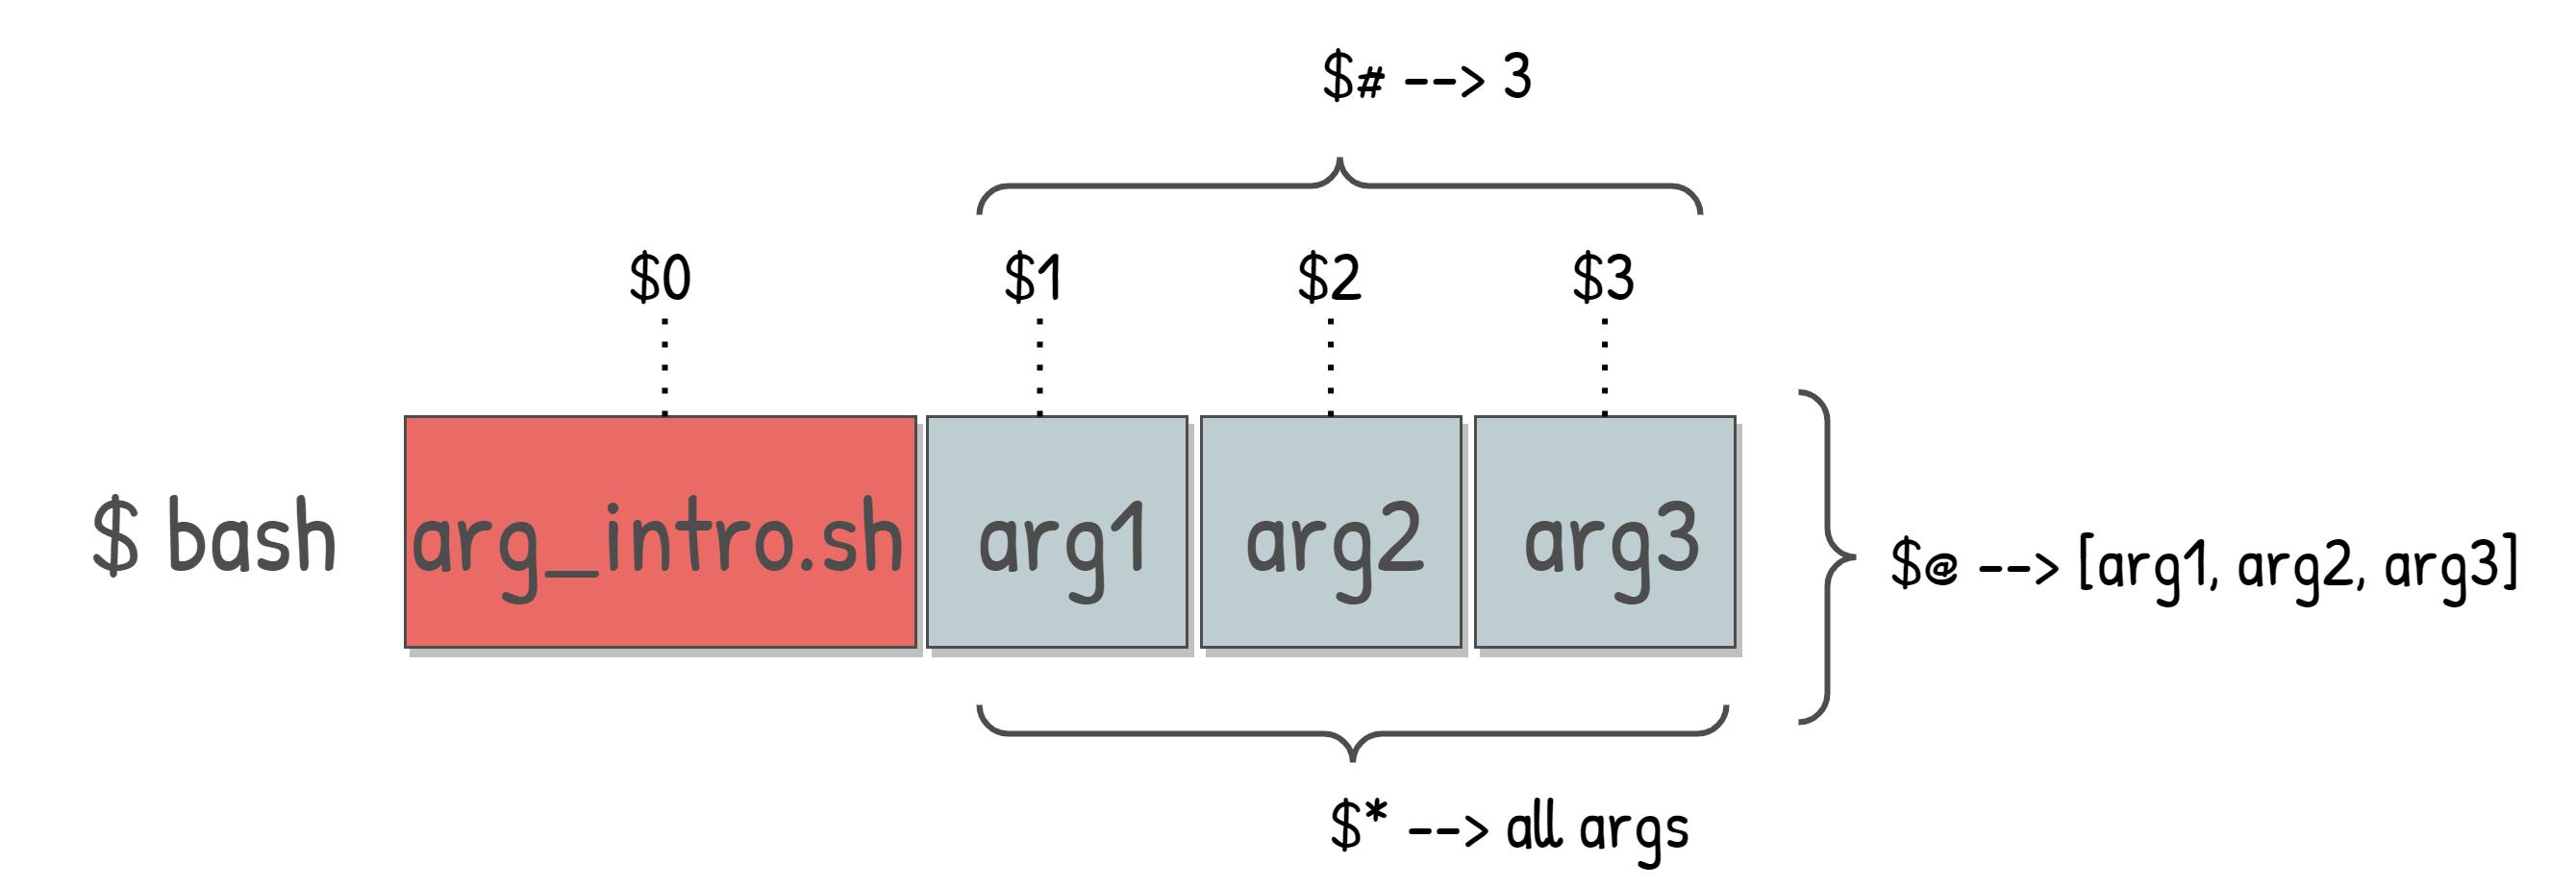 Representation of positional command-line arguments